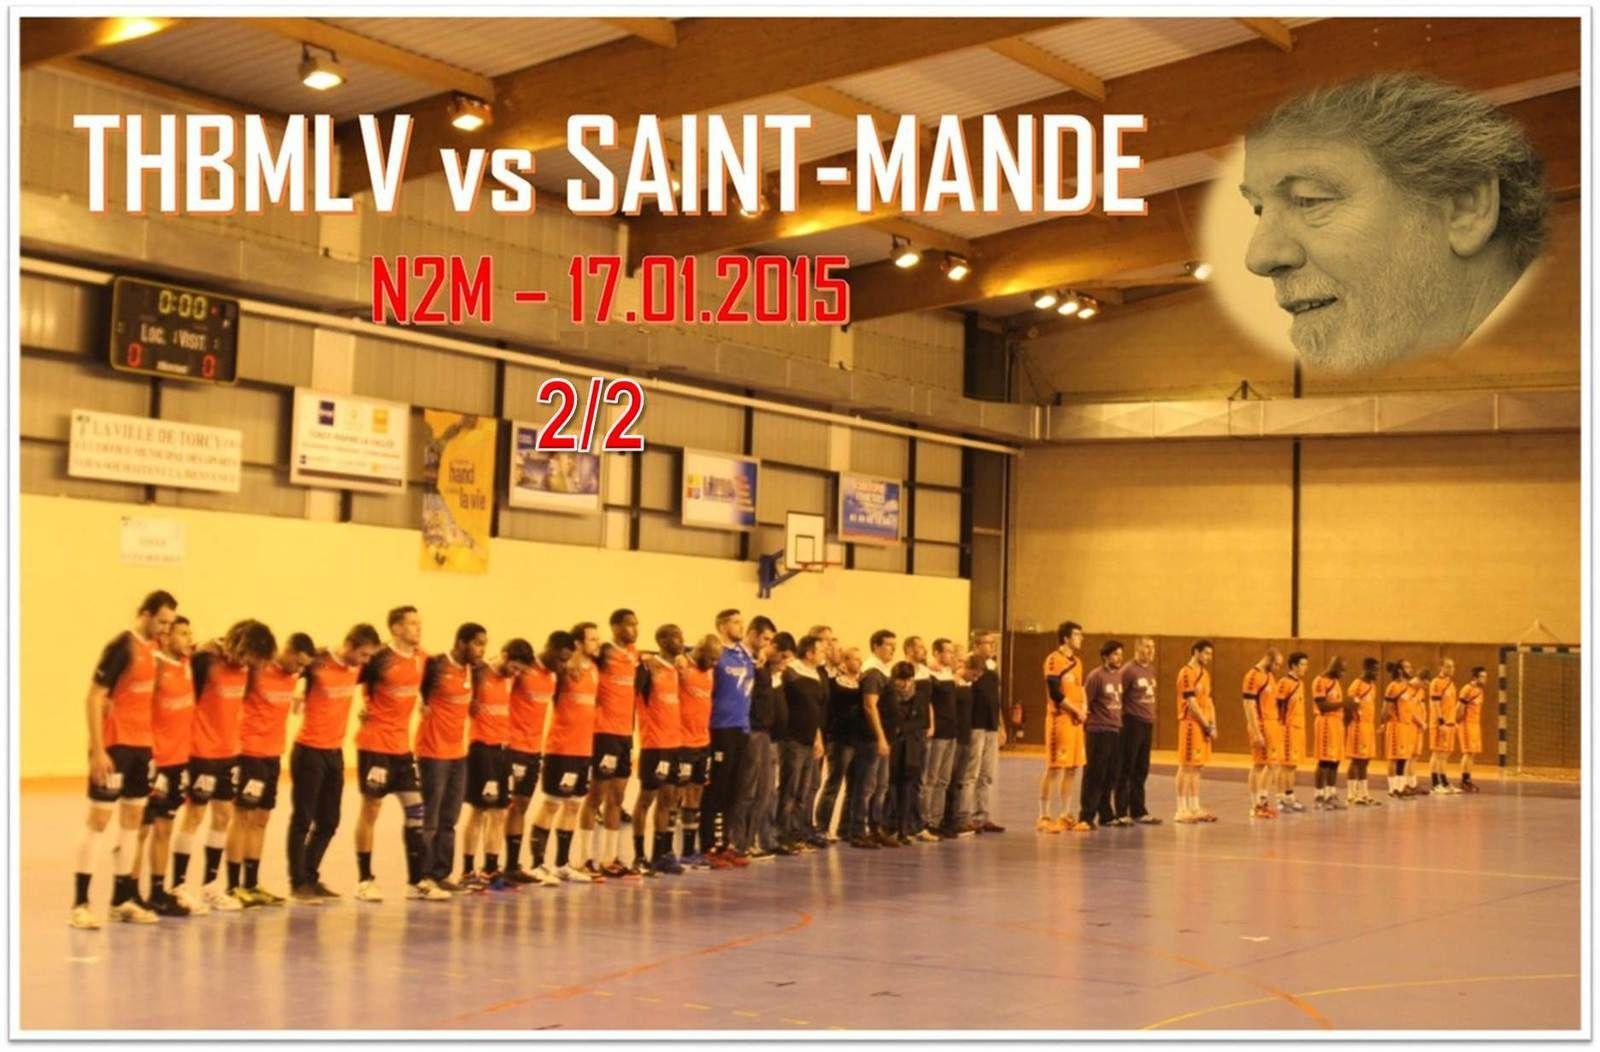 THBMLV vs SAINT-MANDE (N2M) 17.01.2015 (2/2)